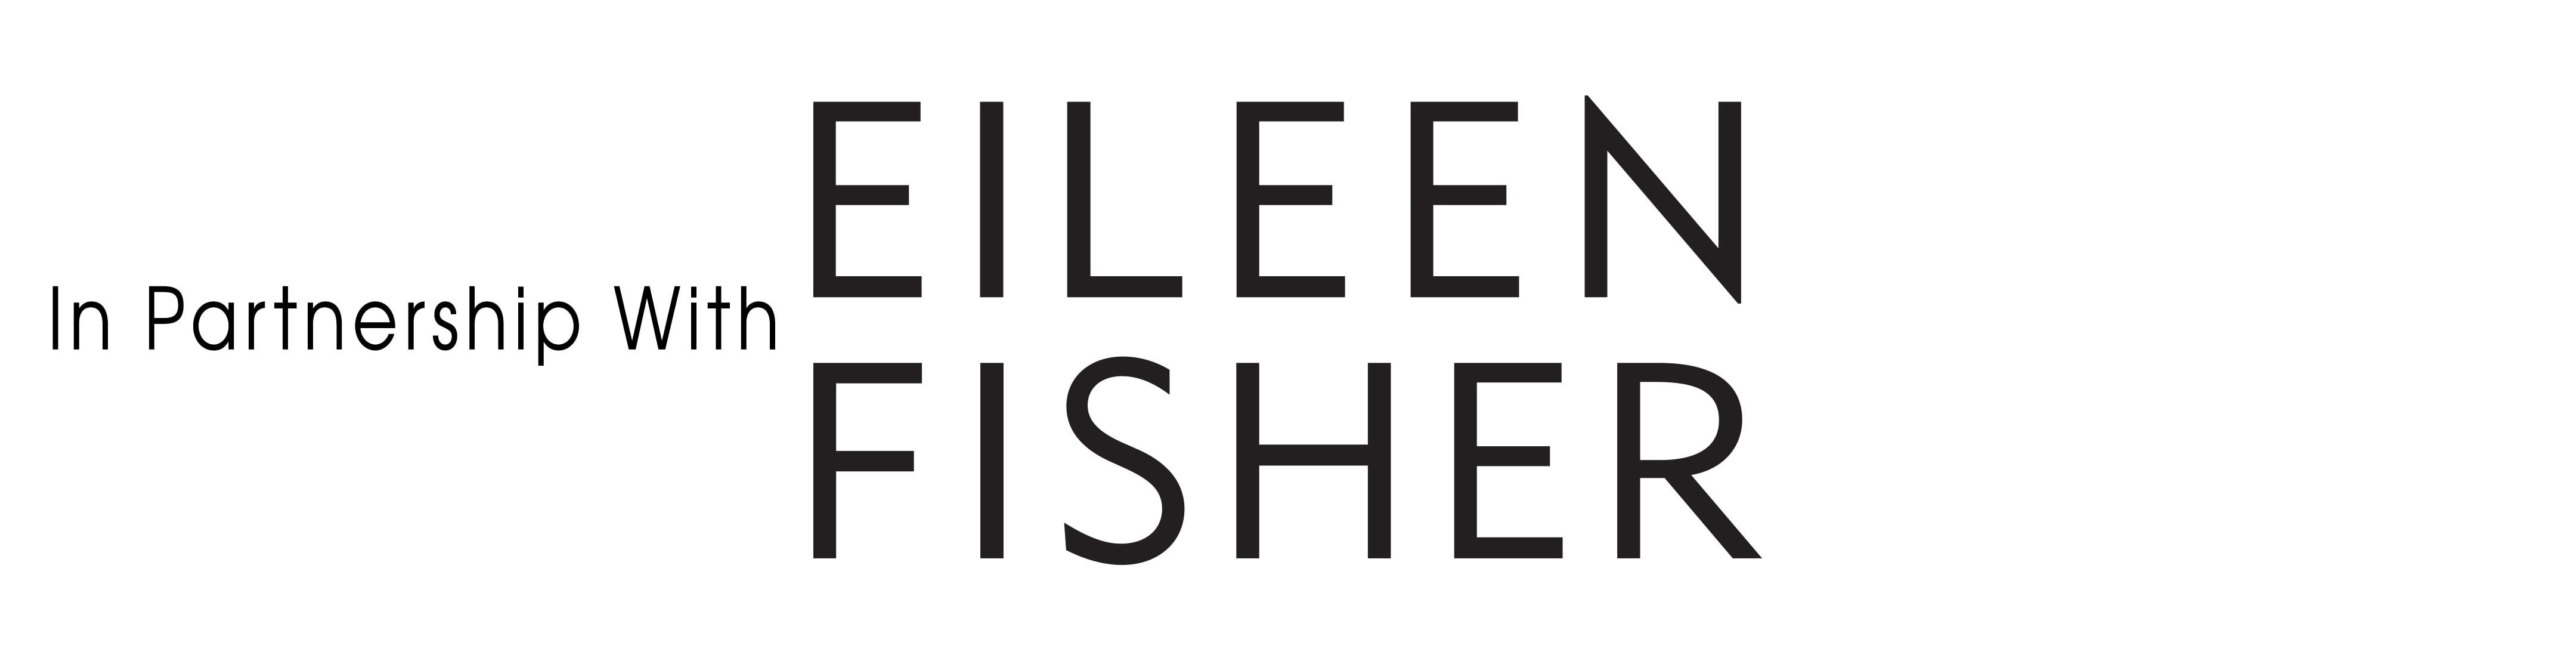 Eileen Fisher IPW